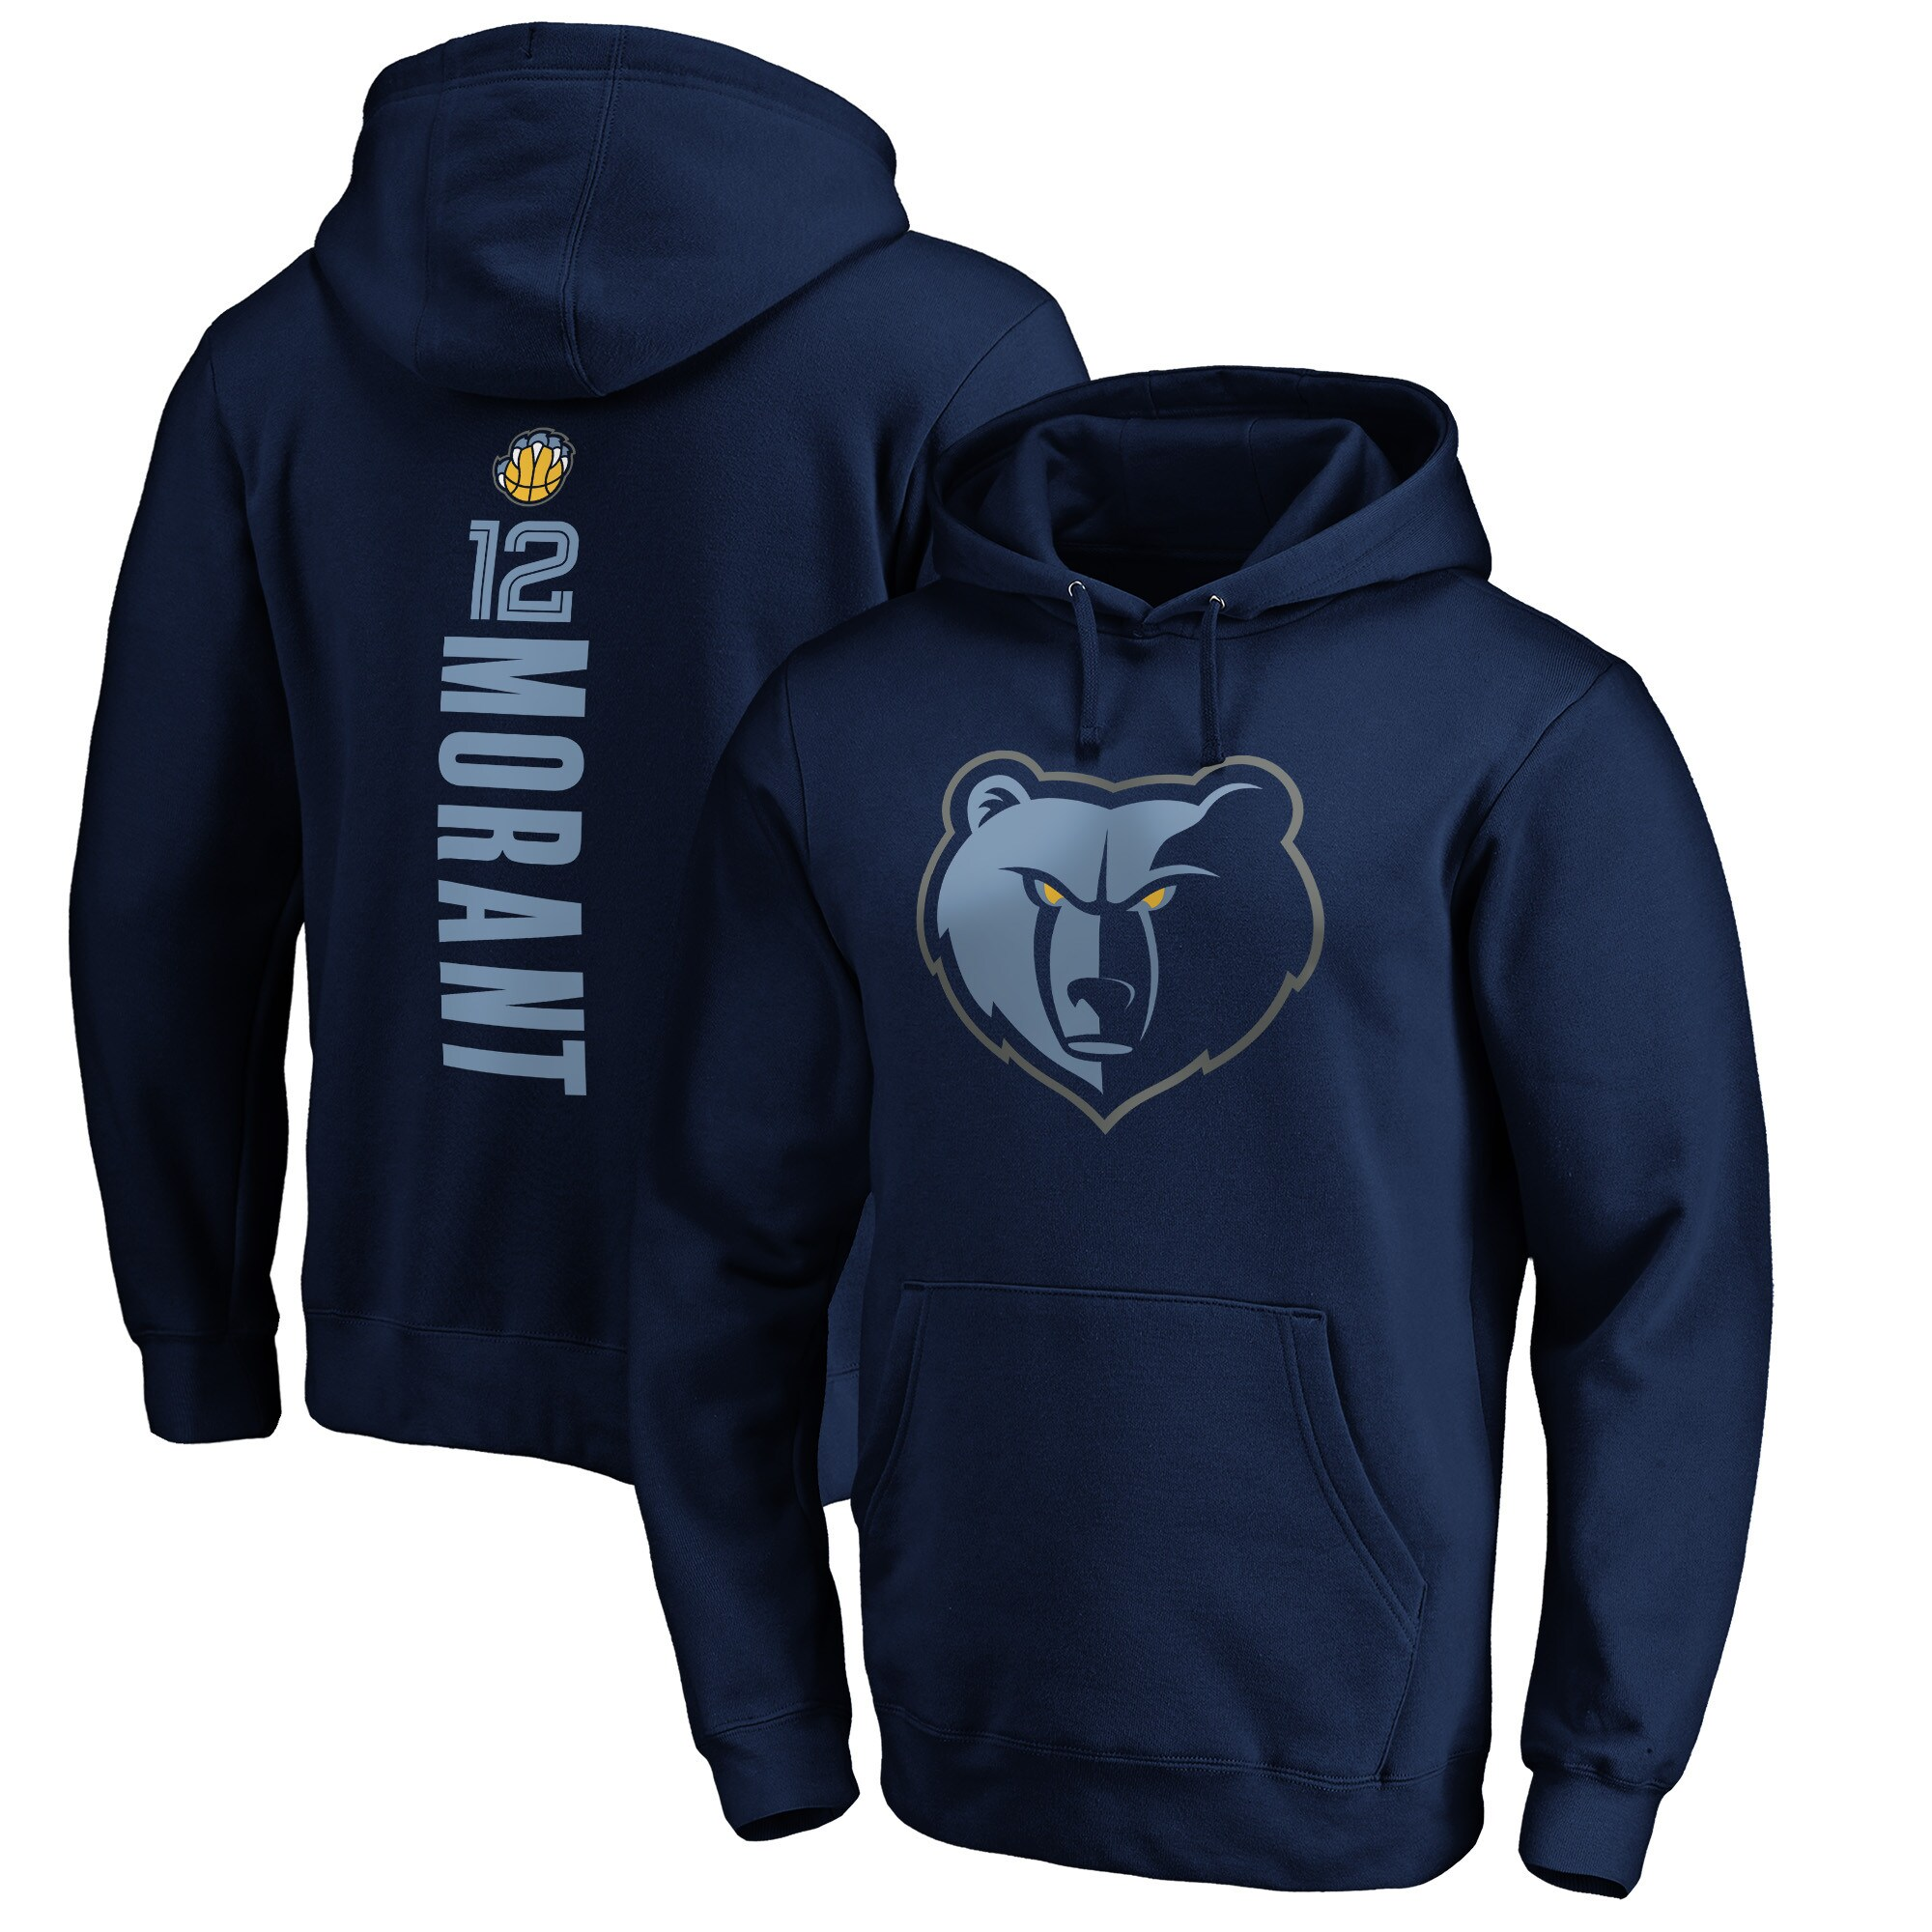 Ja Morant Memphis Grizzlies Fanatics Branded Team Playmaker Name & Number Pullover Hoodie - Navy